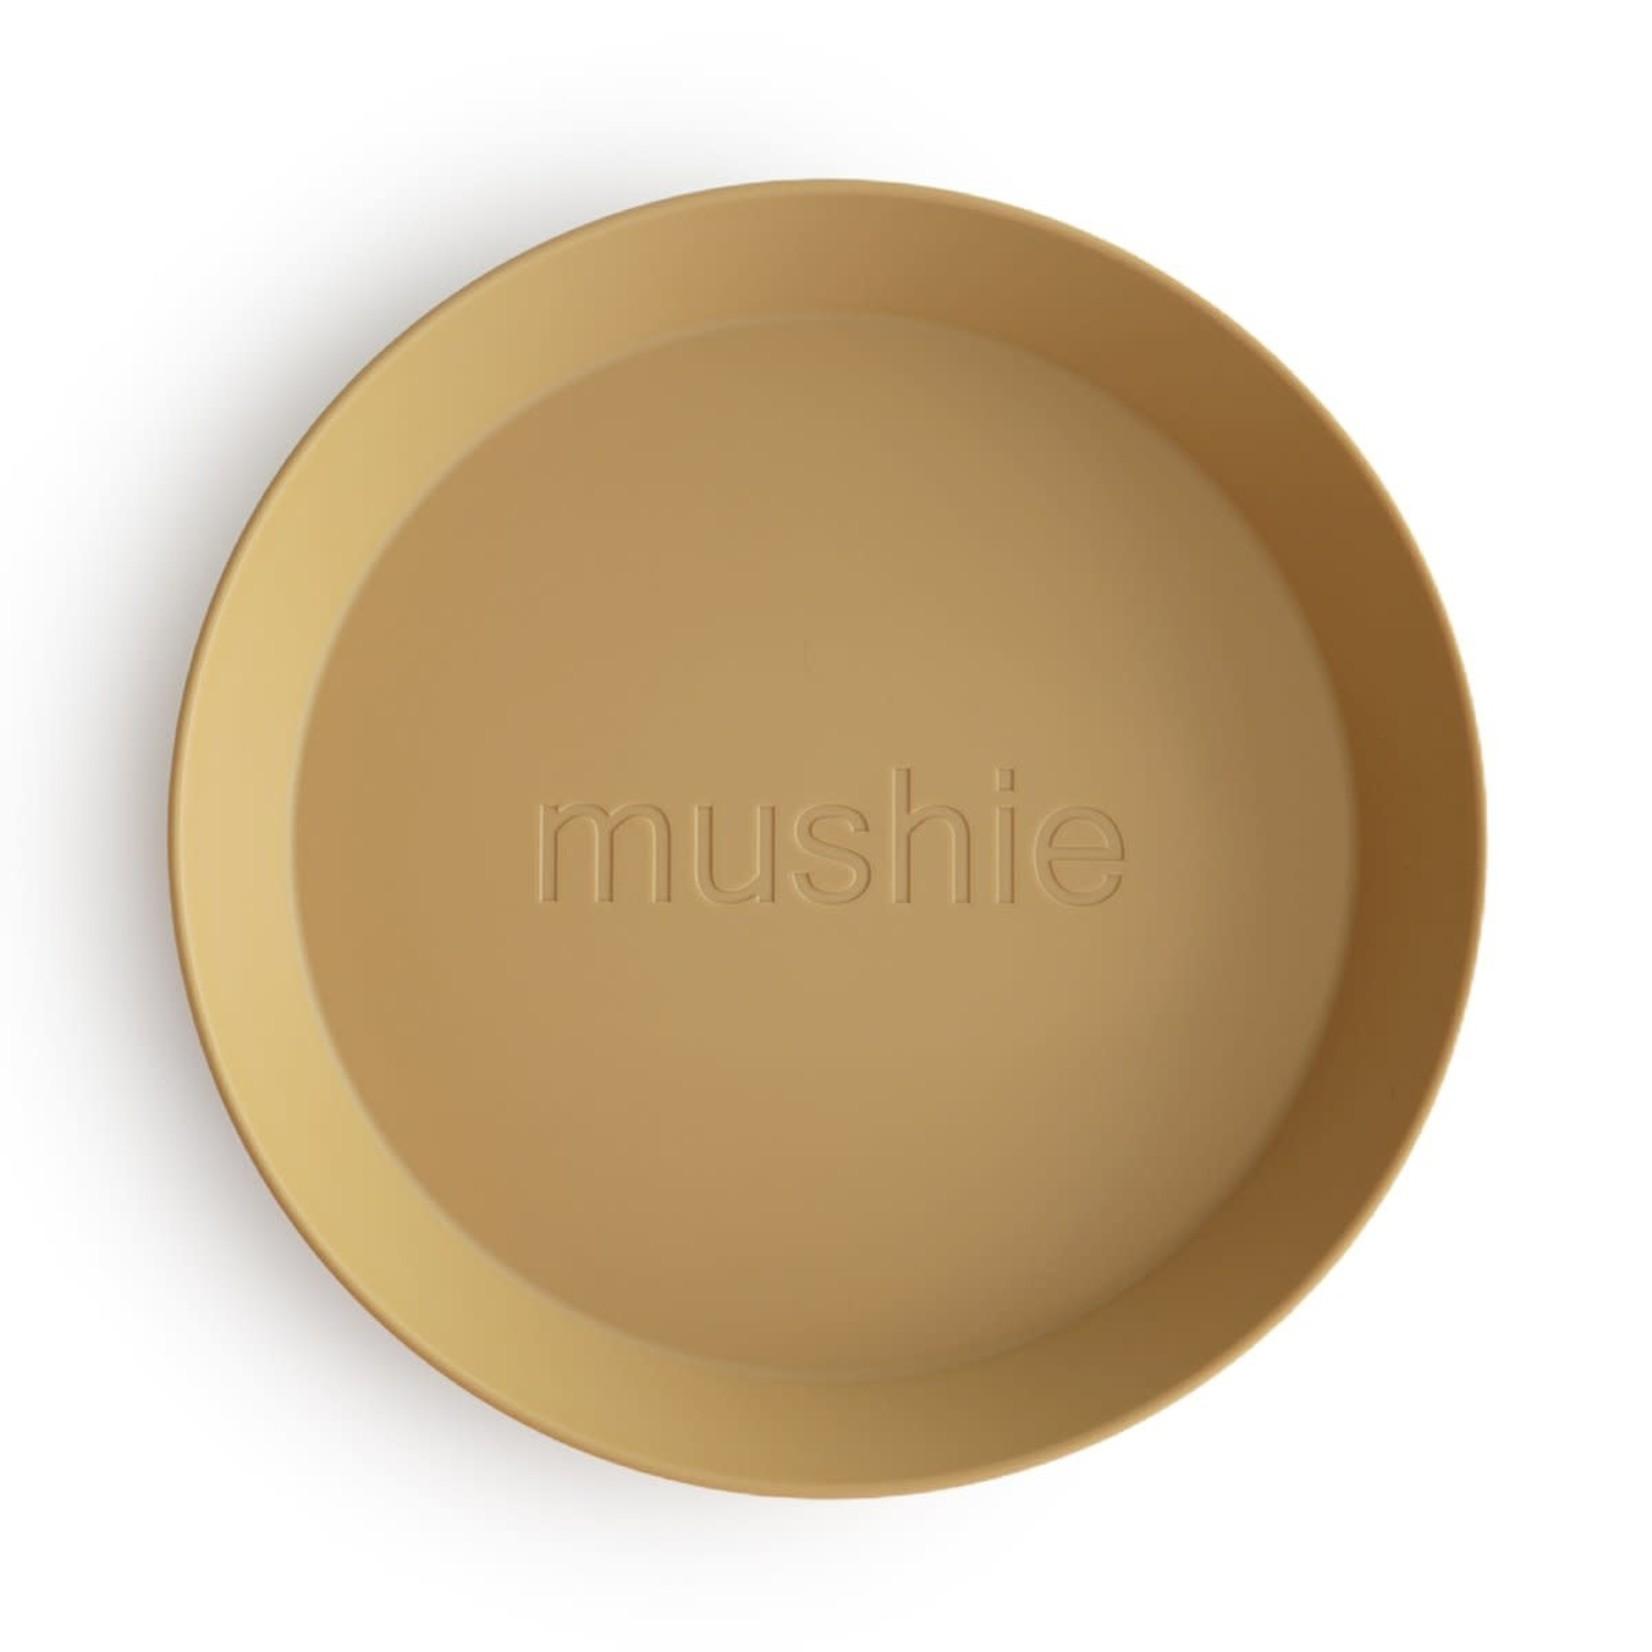 Mushie Borden 2 stuks (Mustard)